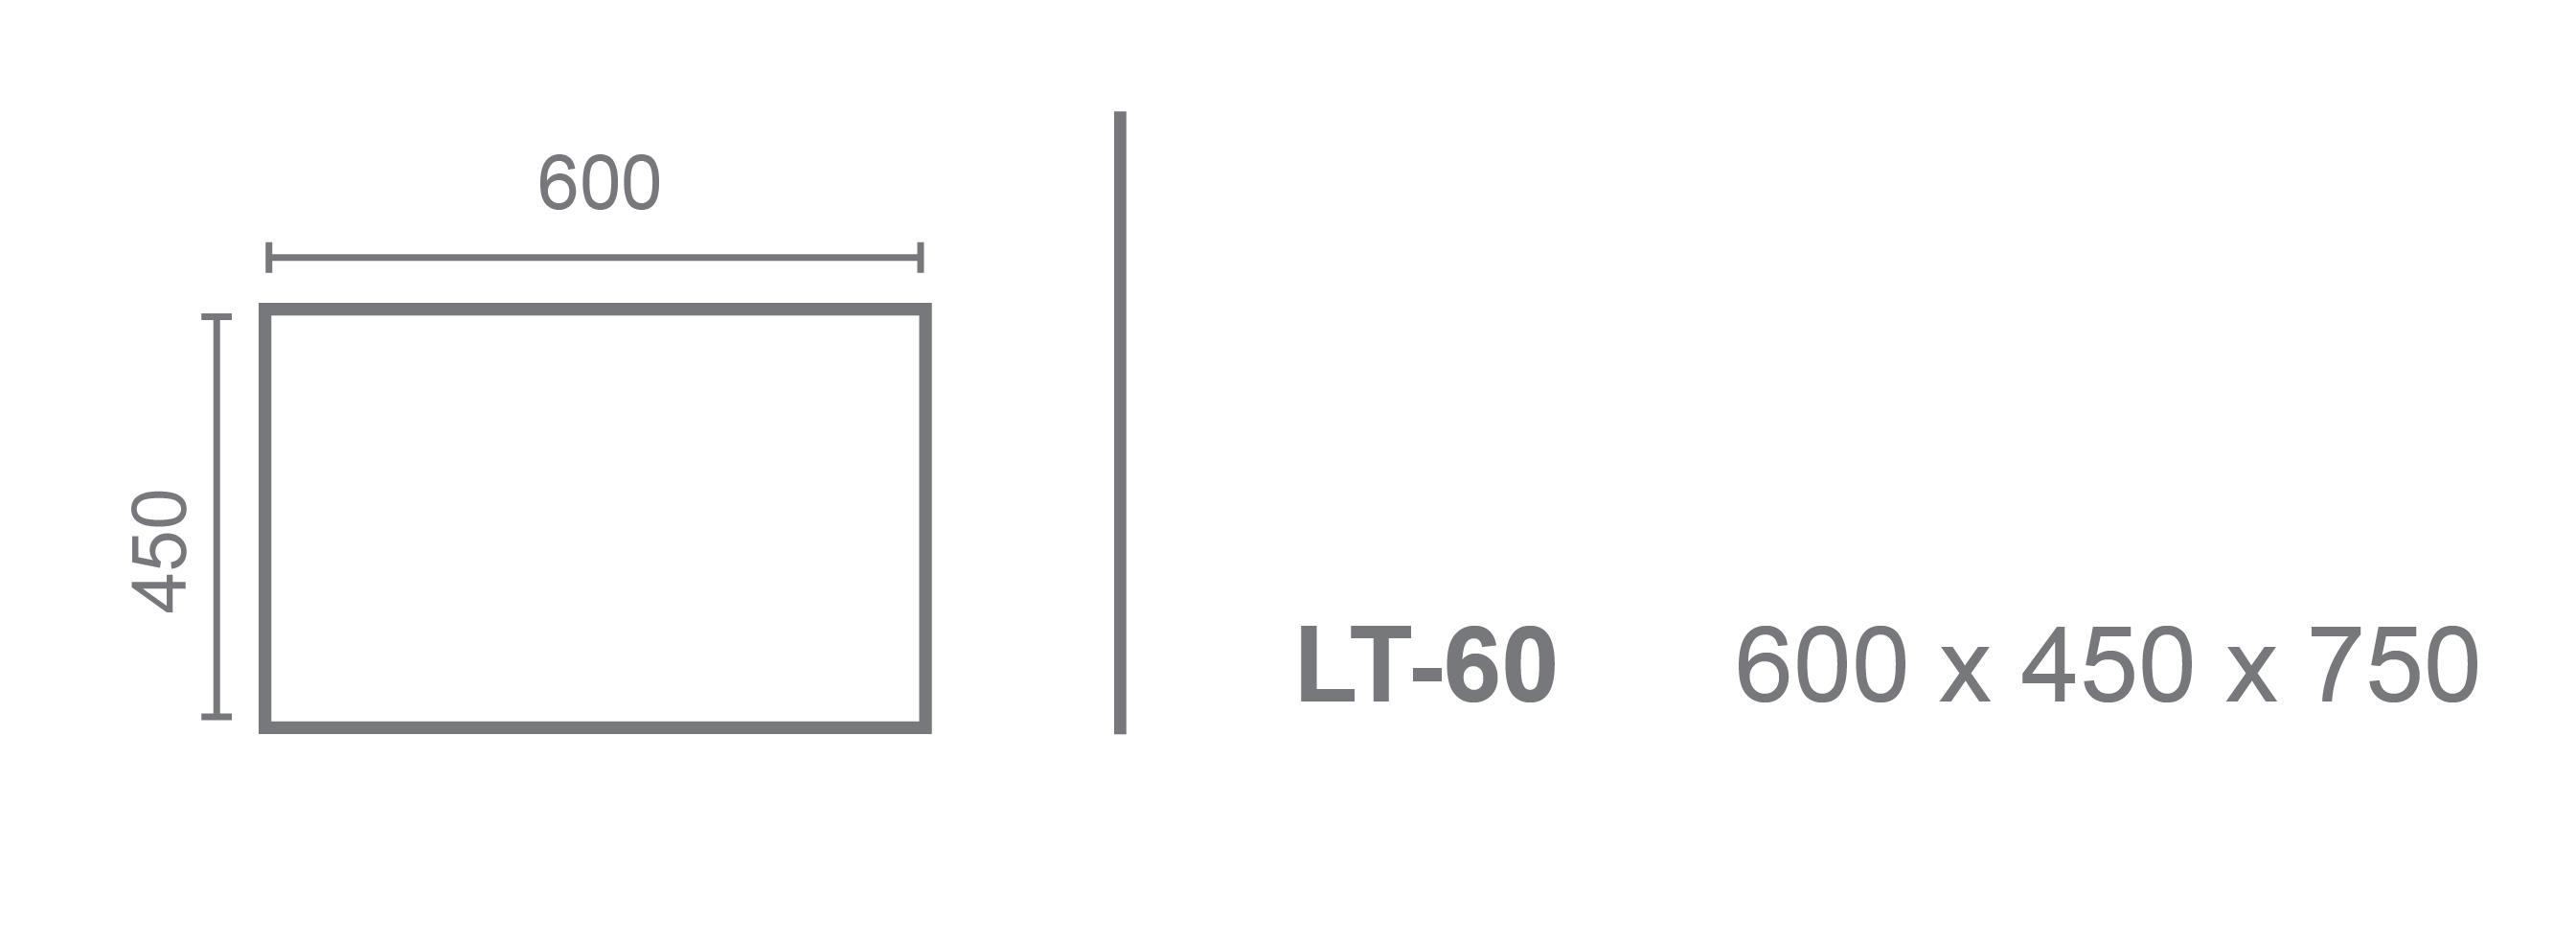 LT-60